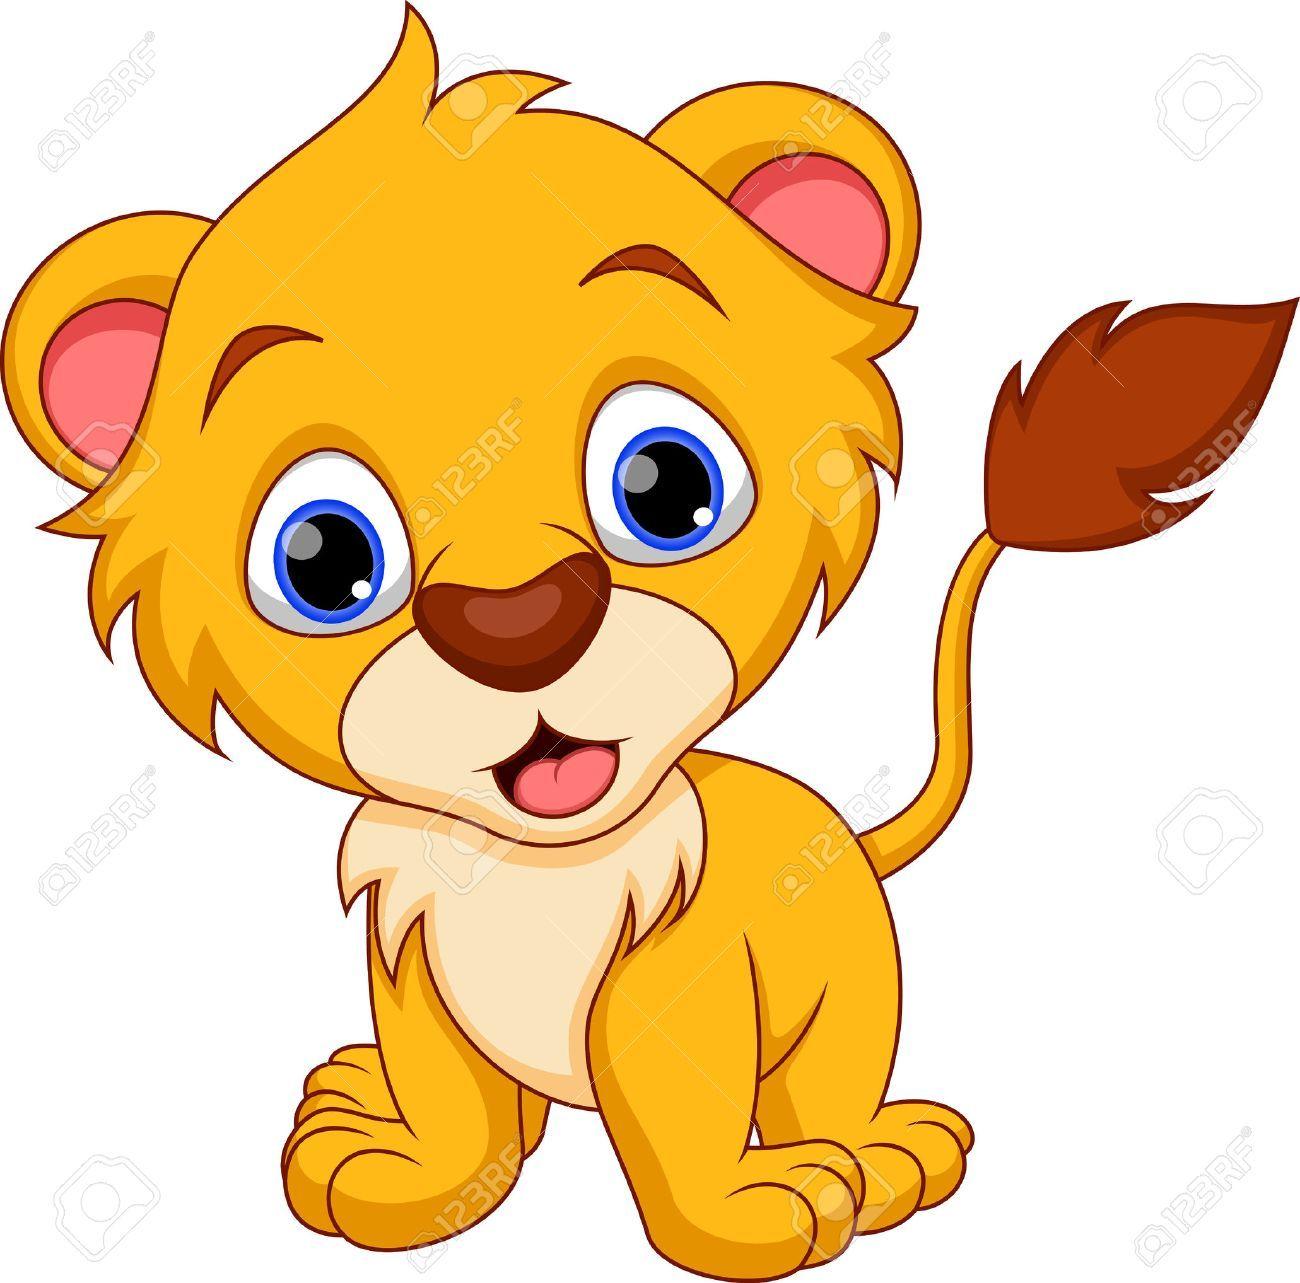 Lion and cub clipart stock Lion cub clipart 8 » Clipart Portal stock